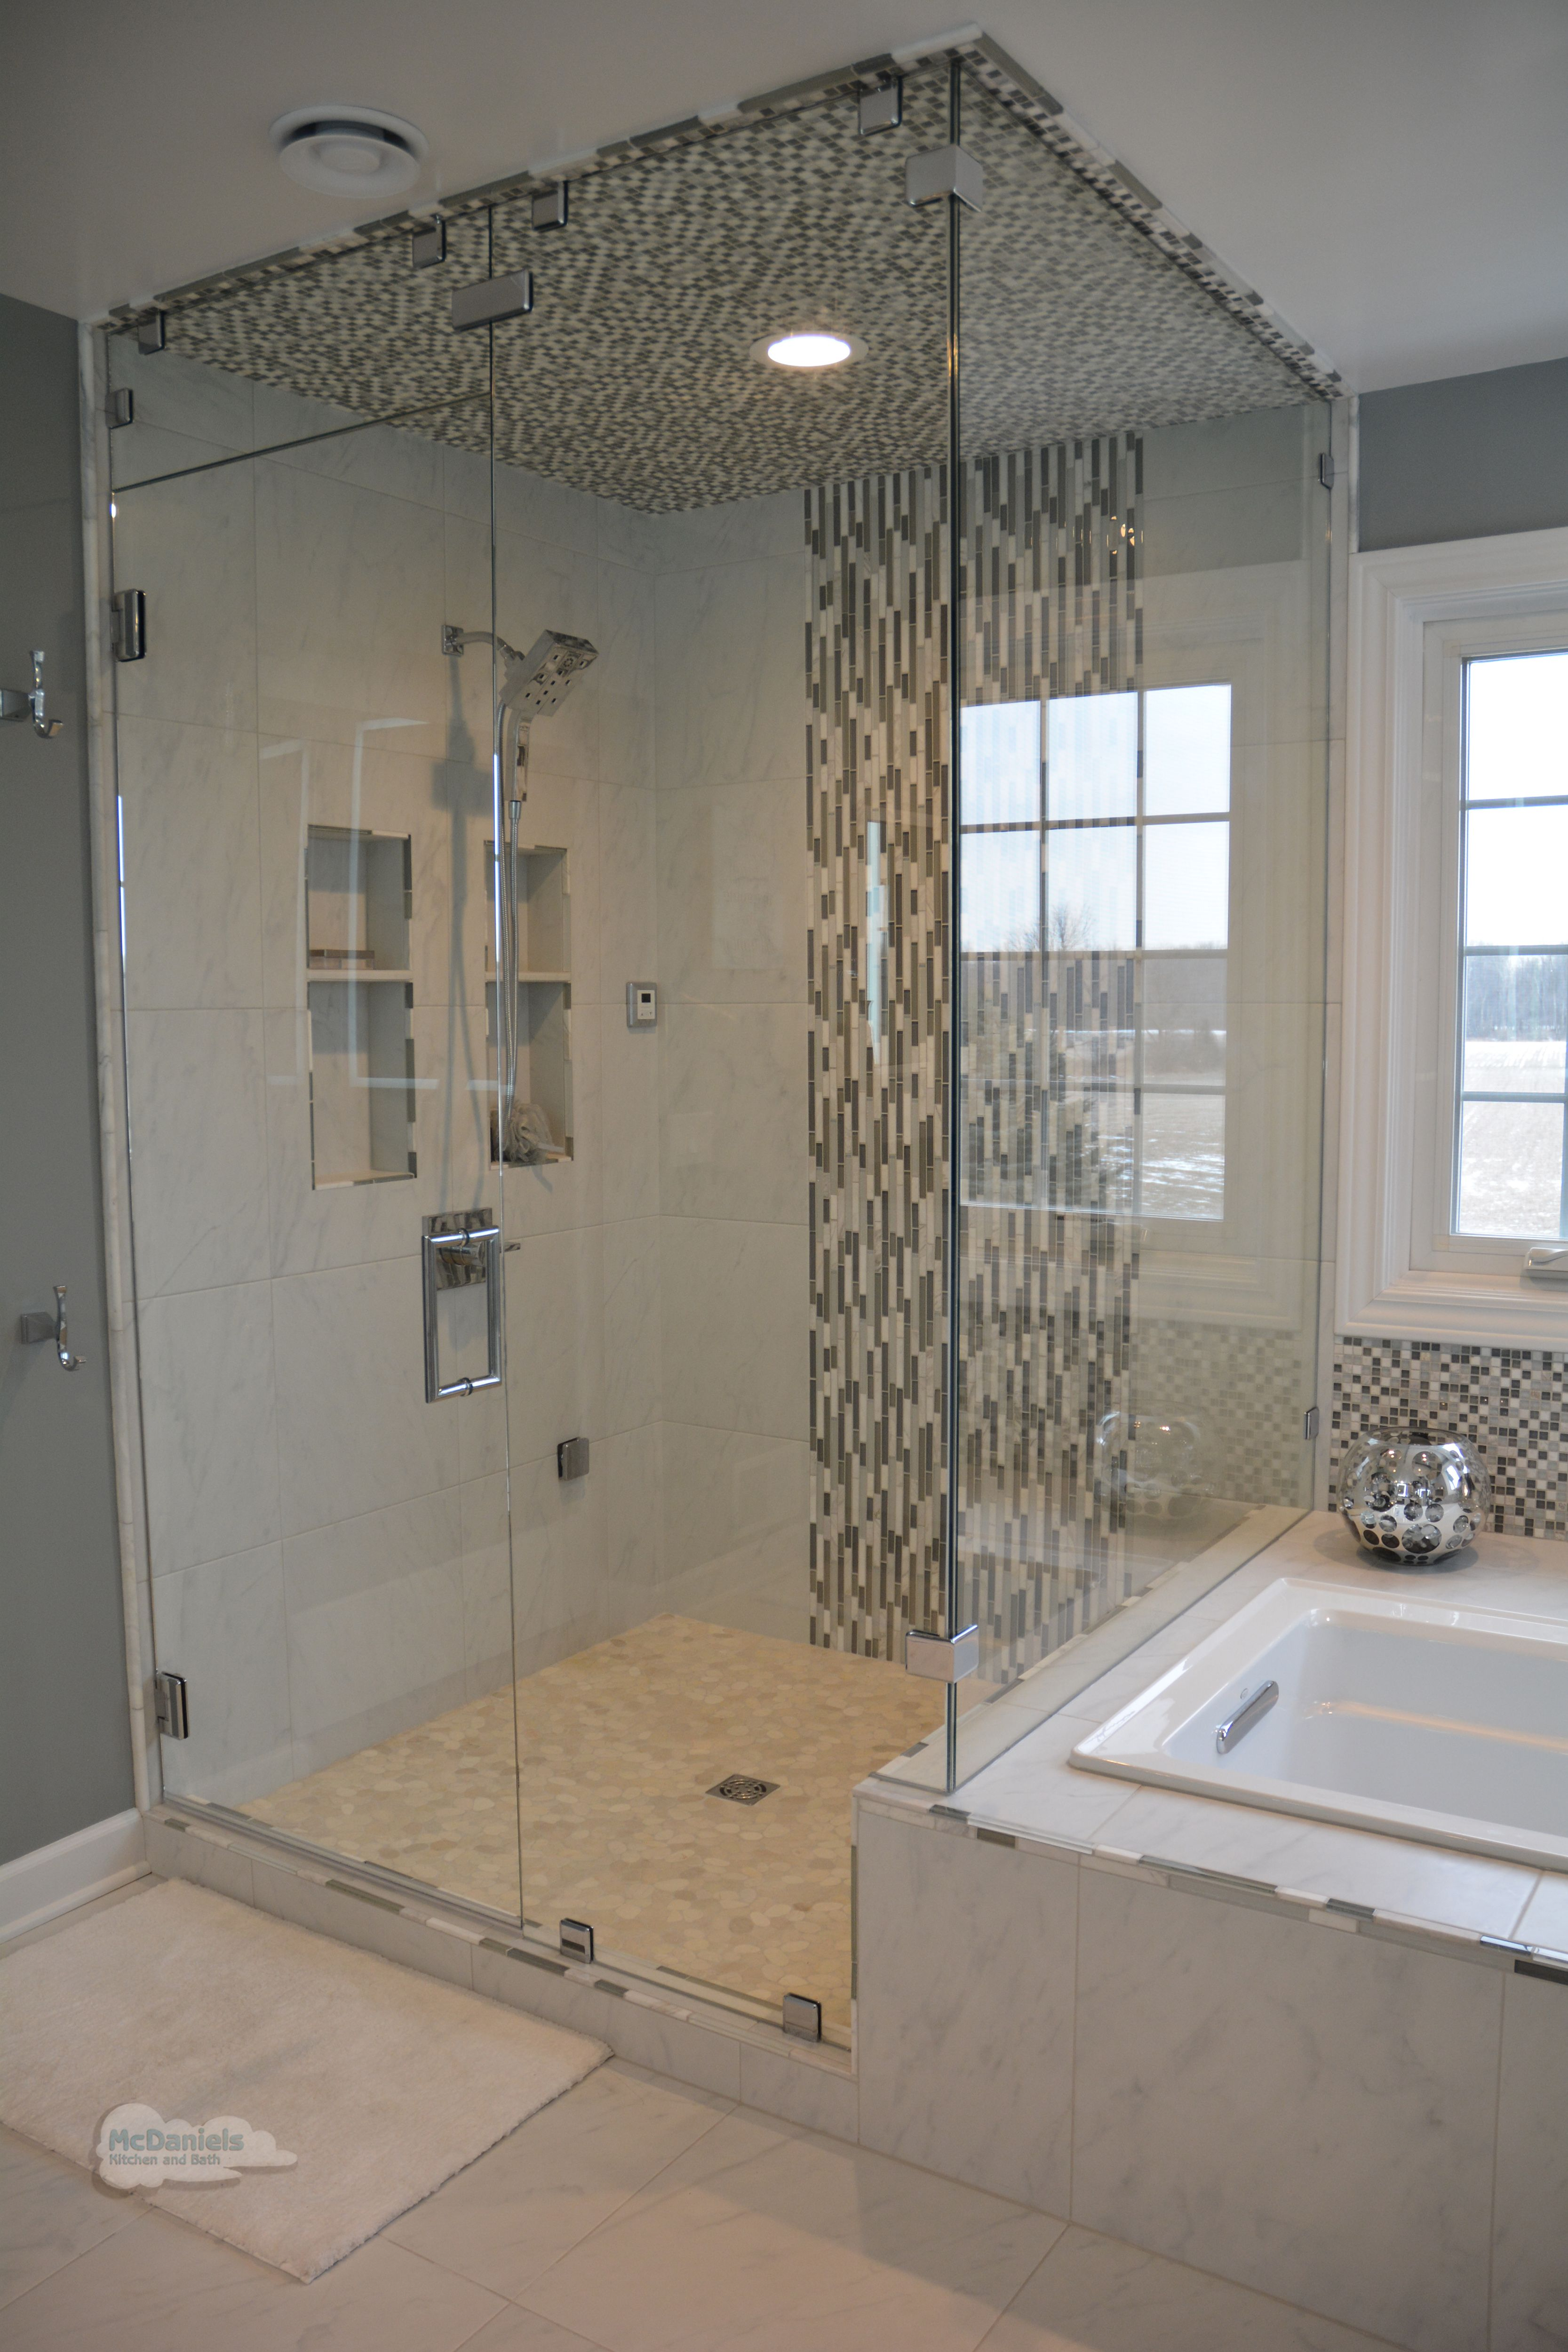 Local Kitchen & Bathroom Design & Remodeling Services Lansing PA ...